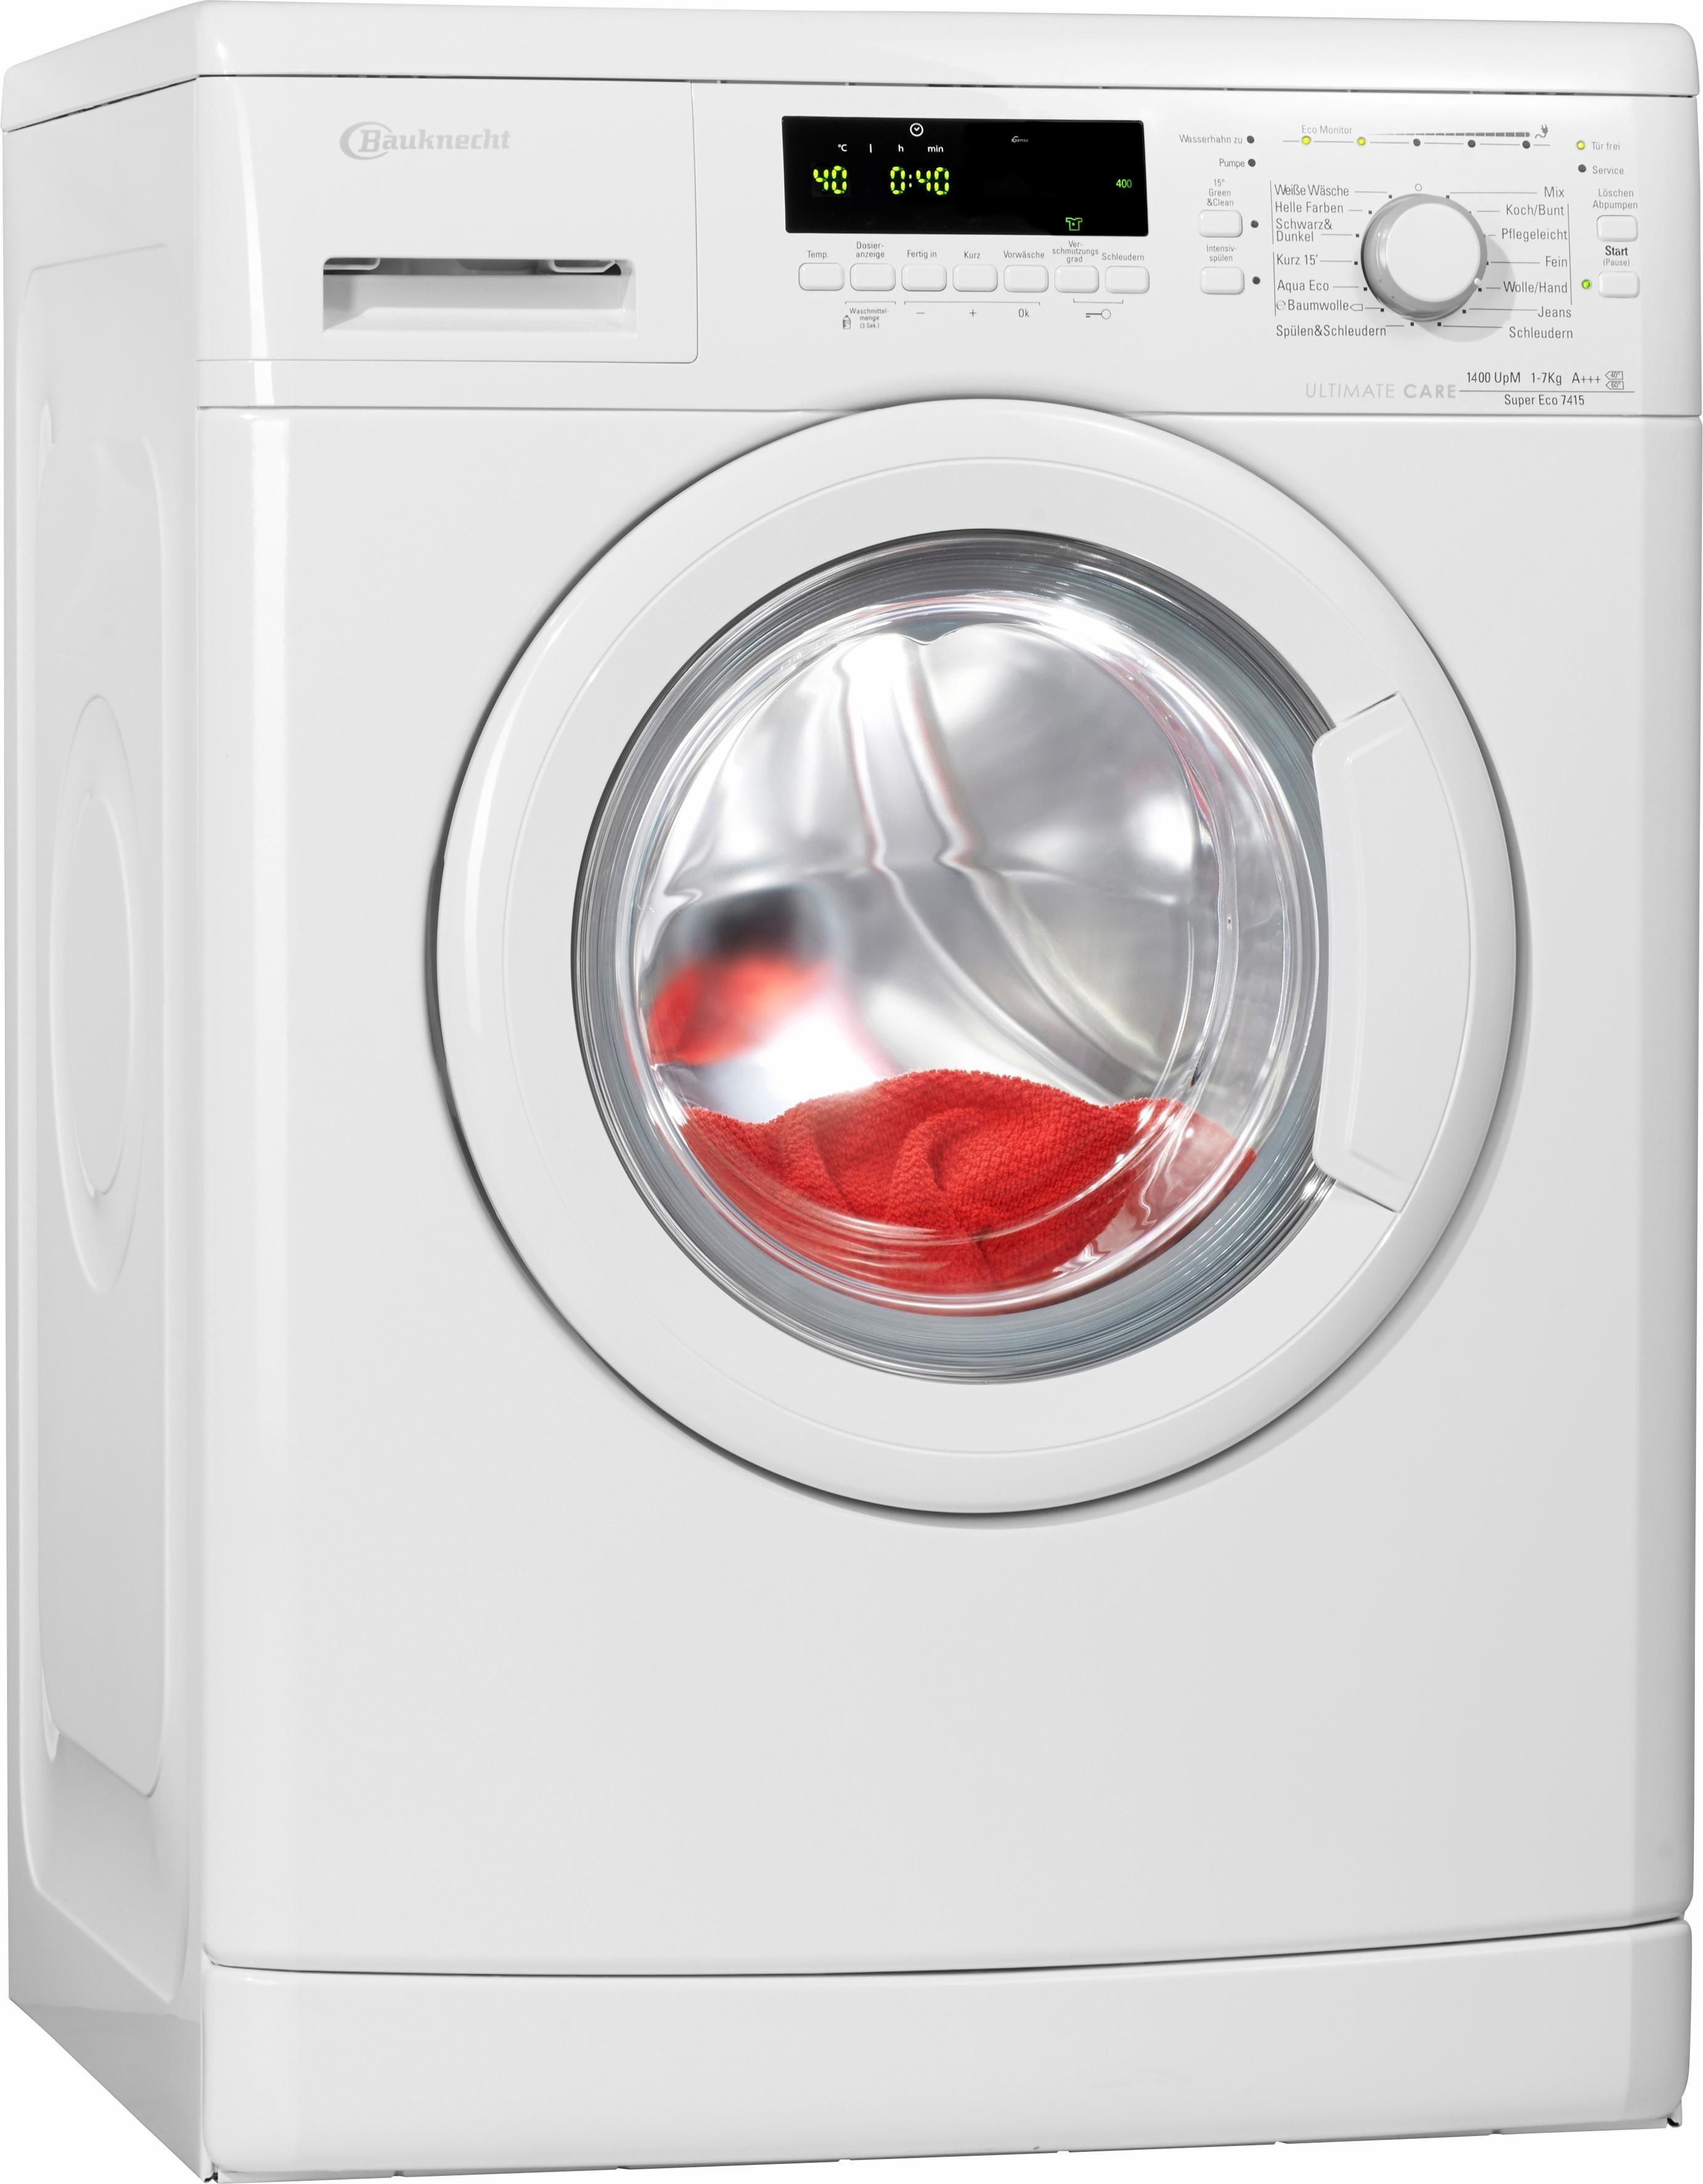 Bauknecht wasmachine Super Eco 7415, A+++, 7 kg, 1400 tpm - gratis ruilen op otto.nl